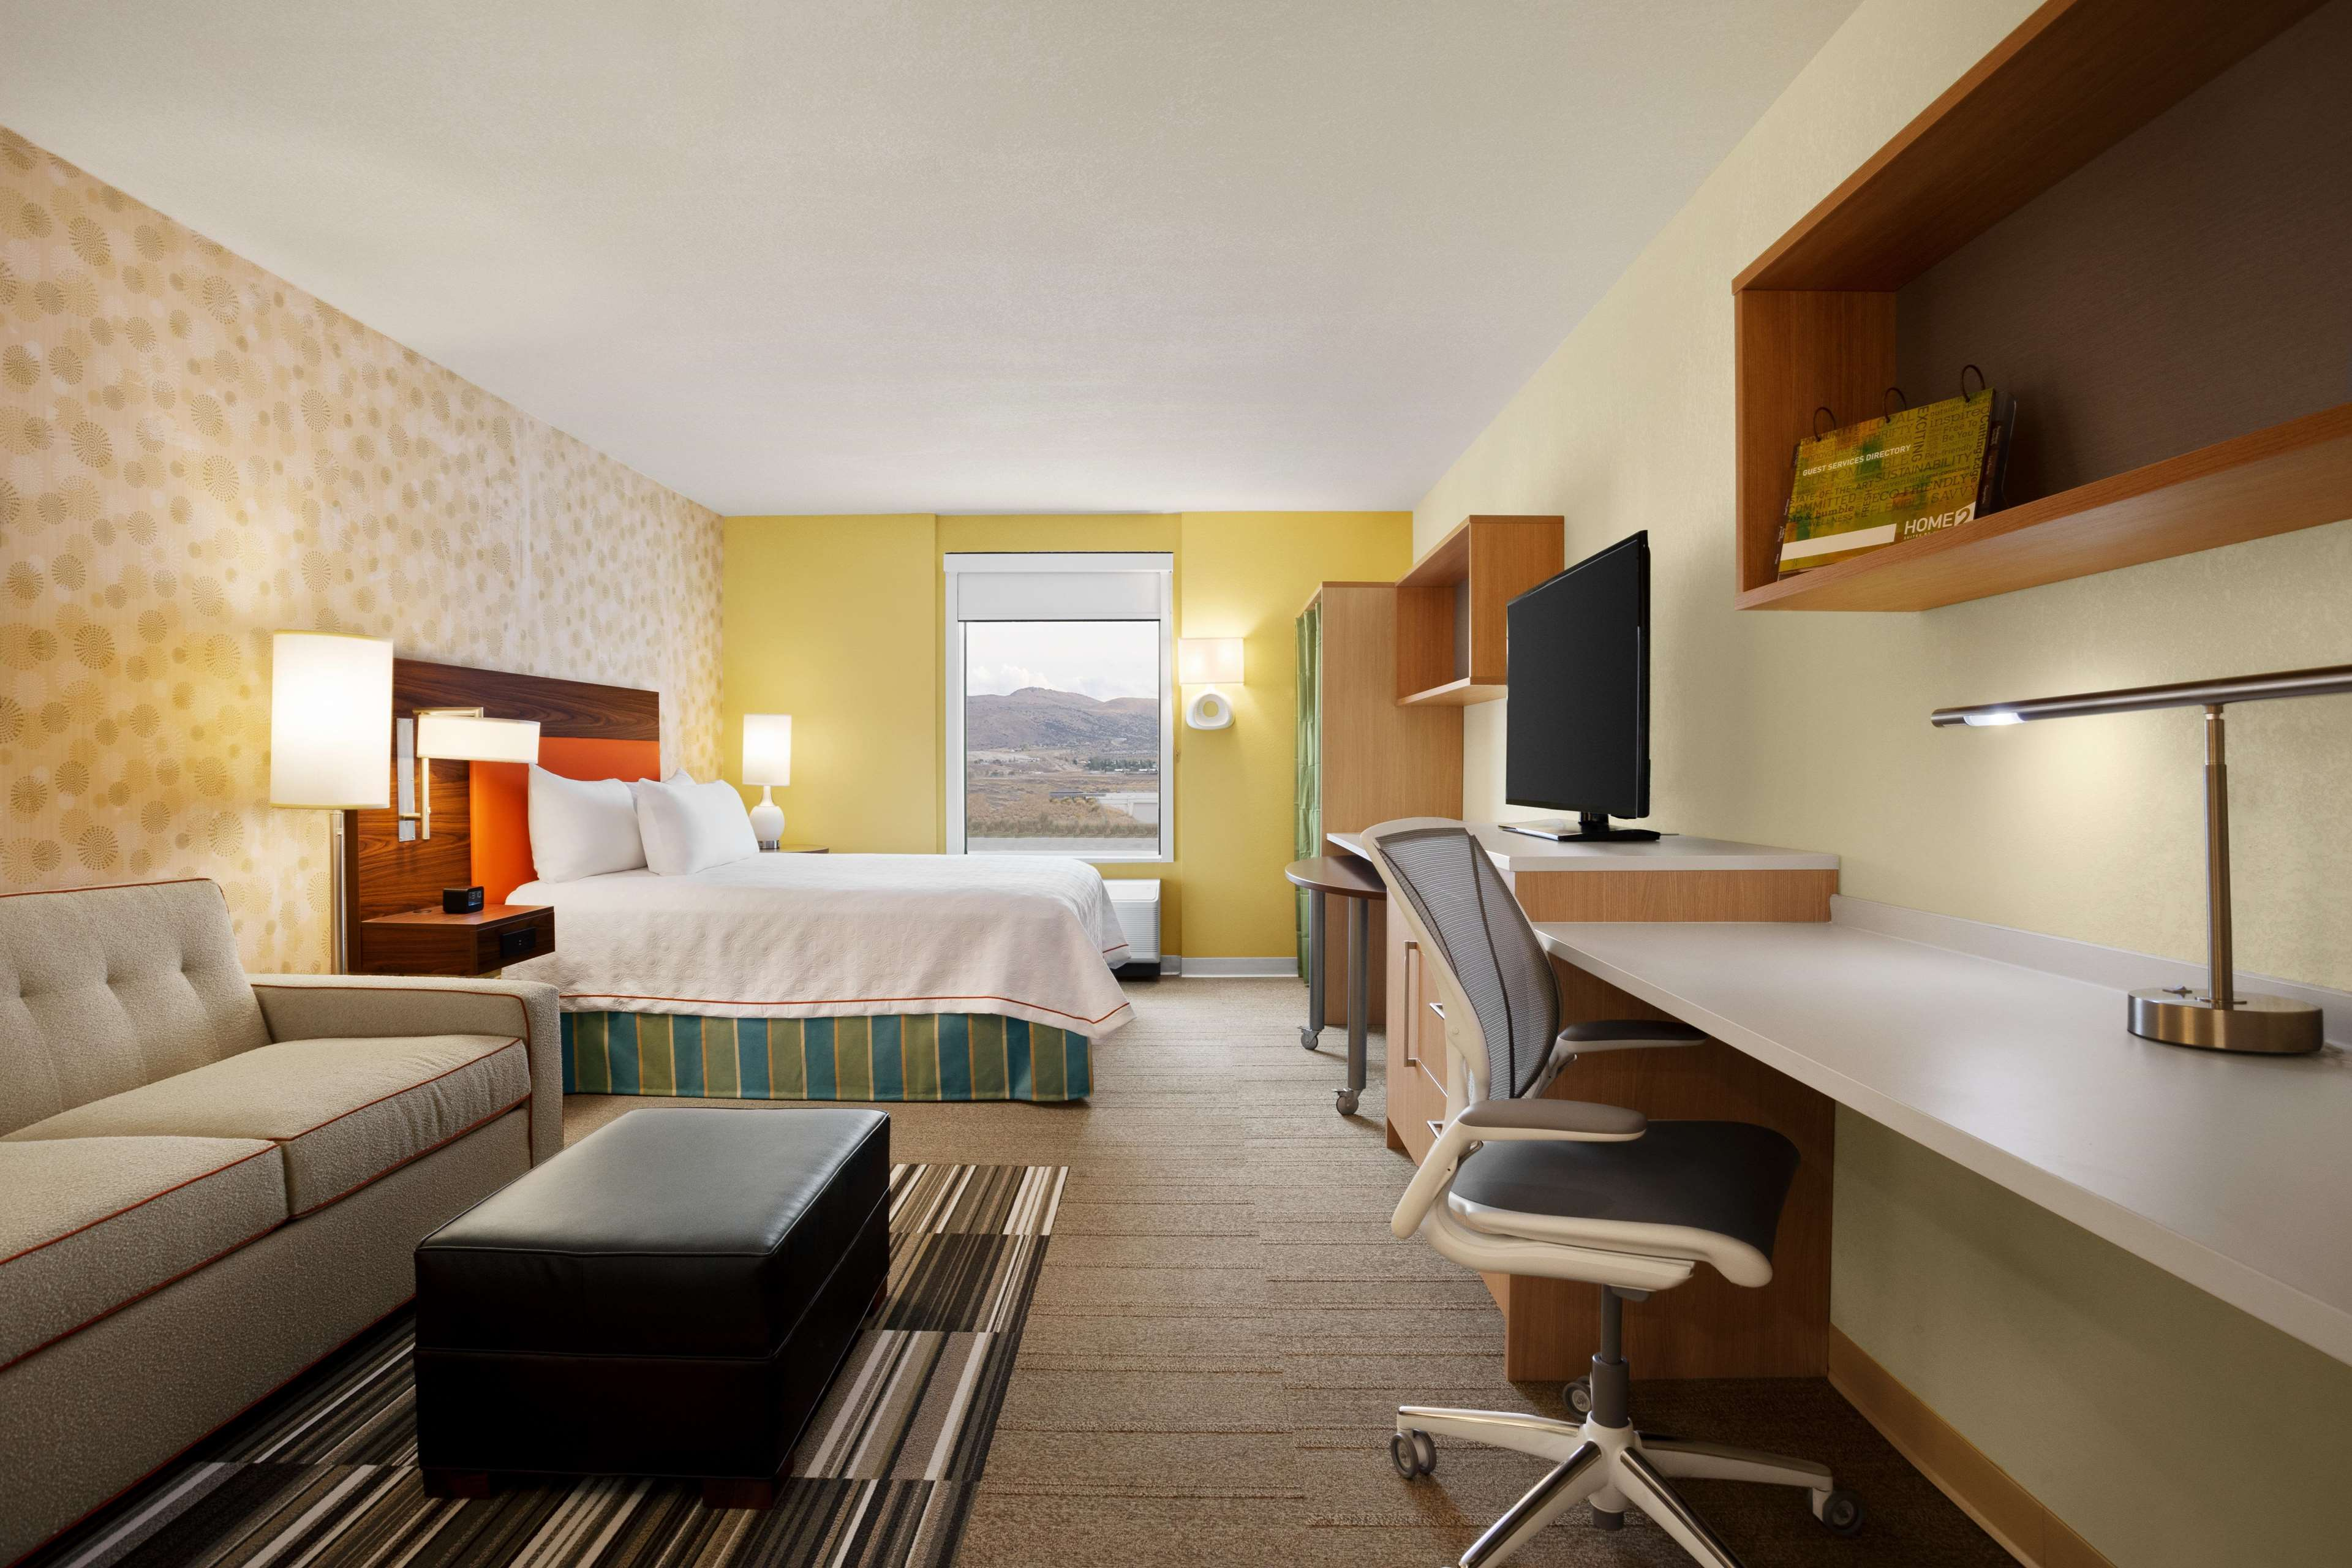 Home2 Suites by Hilton Elko image 22